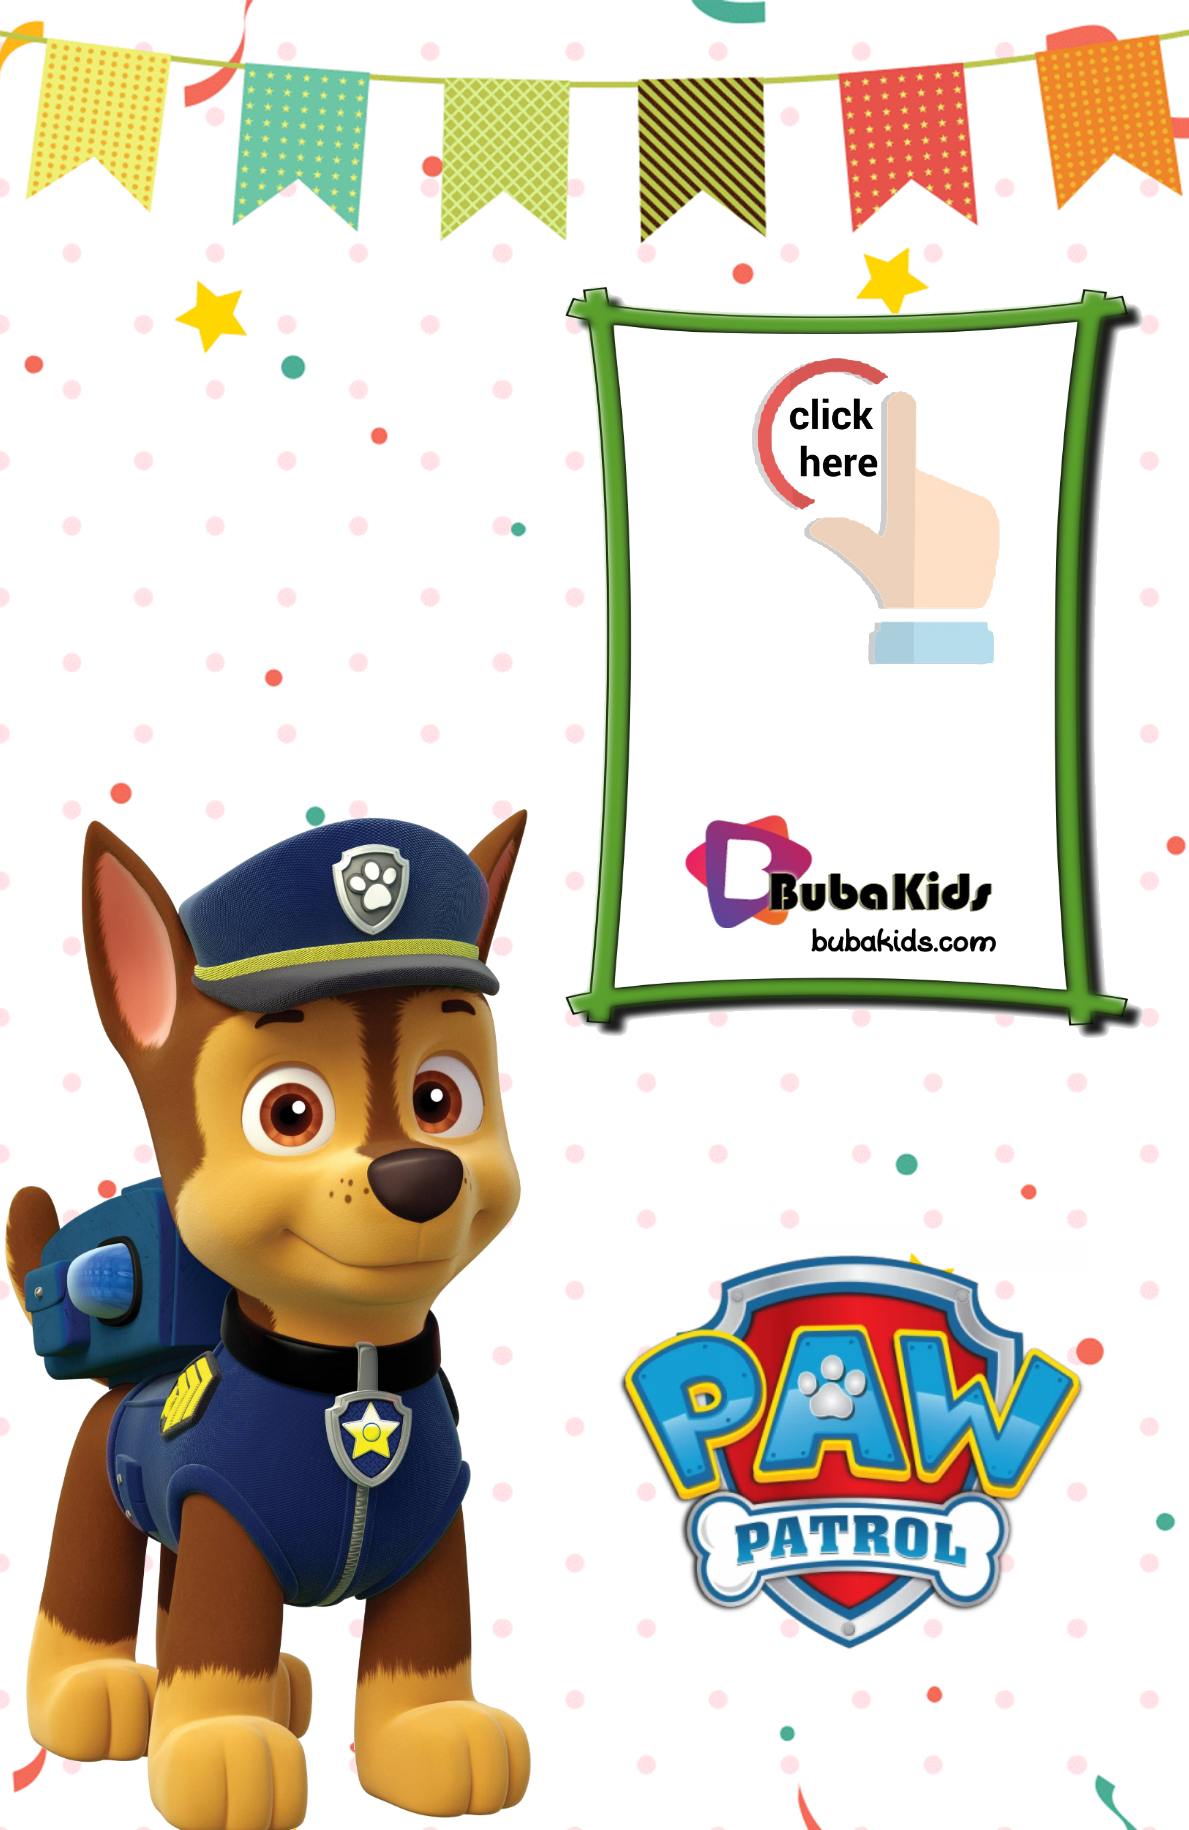 Chase Paw Patrol Free Printable Birthday Invitation Card Birthday Card Paw Patrol Birthday Card Free Printable Birthday Cards Printable Birthday Invitations